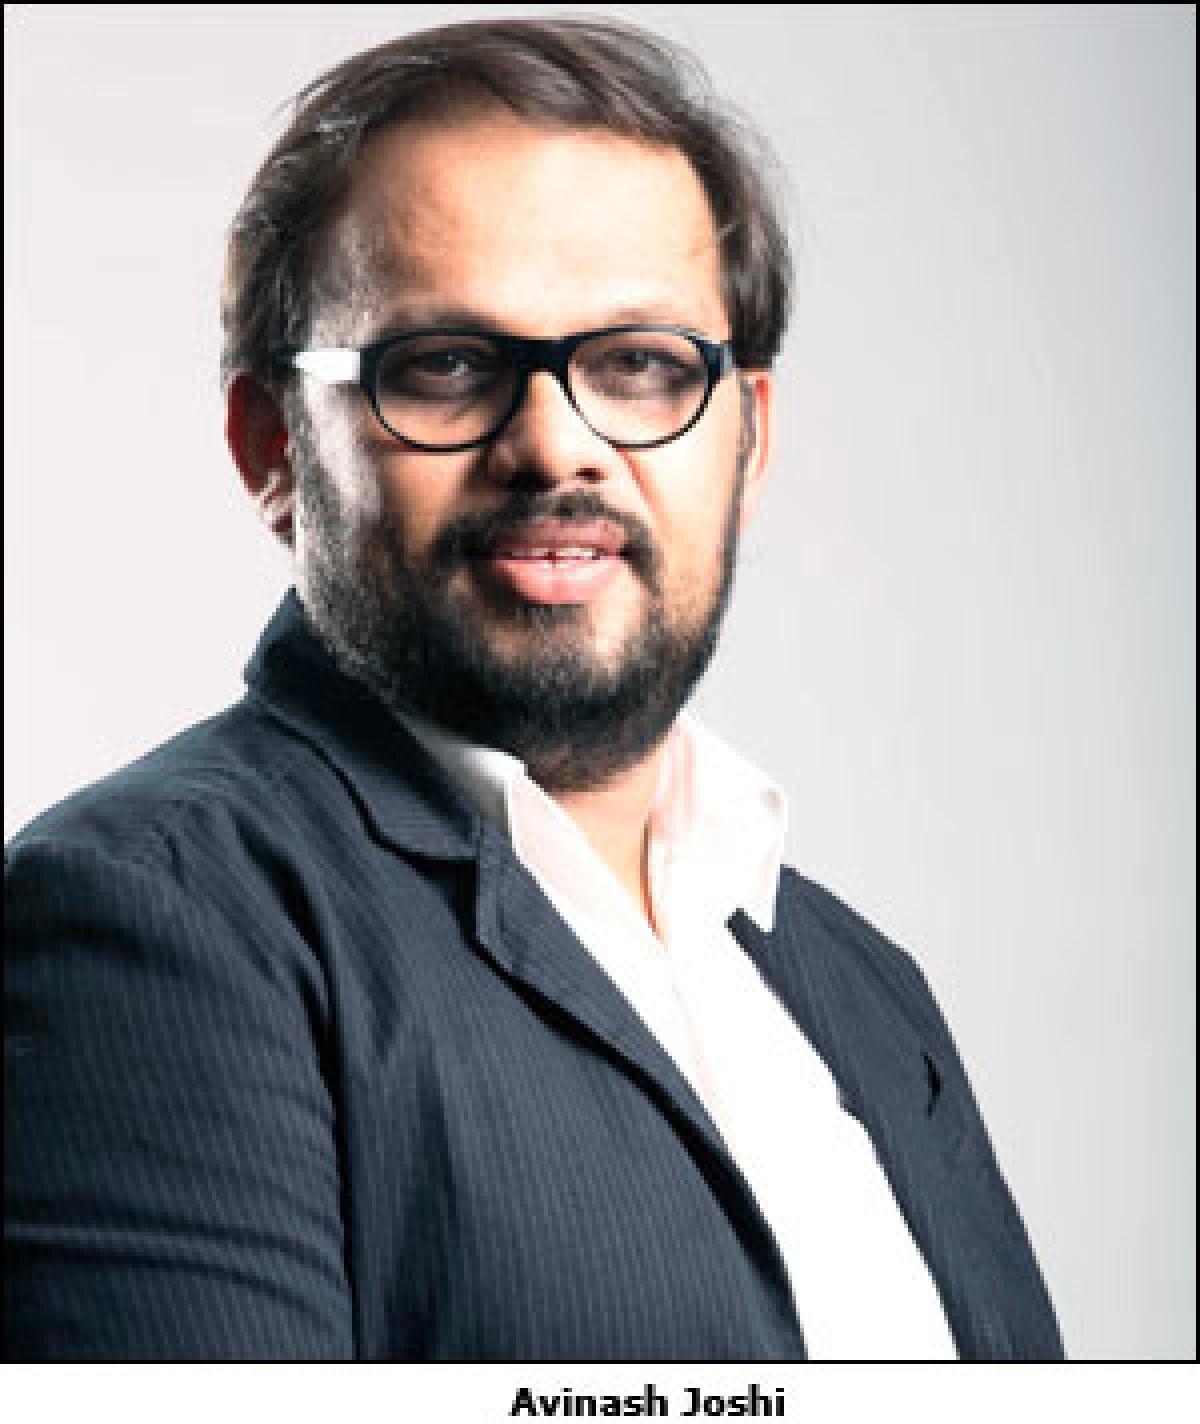 Avinash Joshi quits Cheil Worldwide